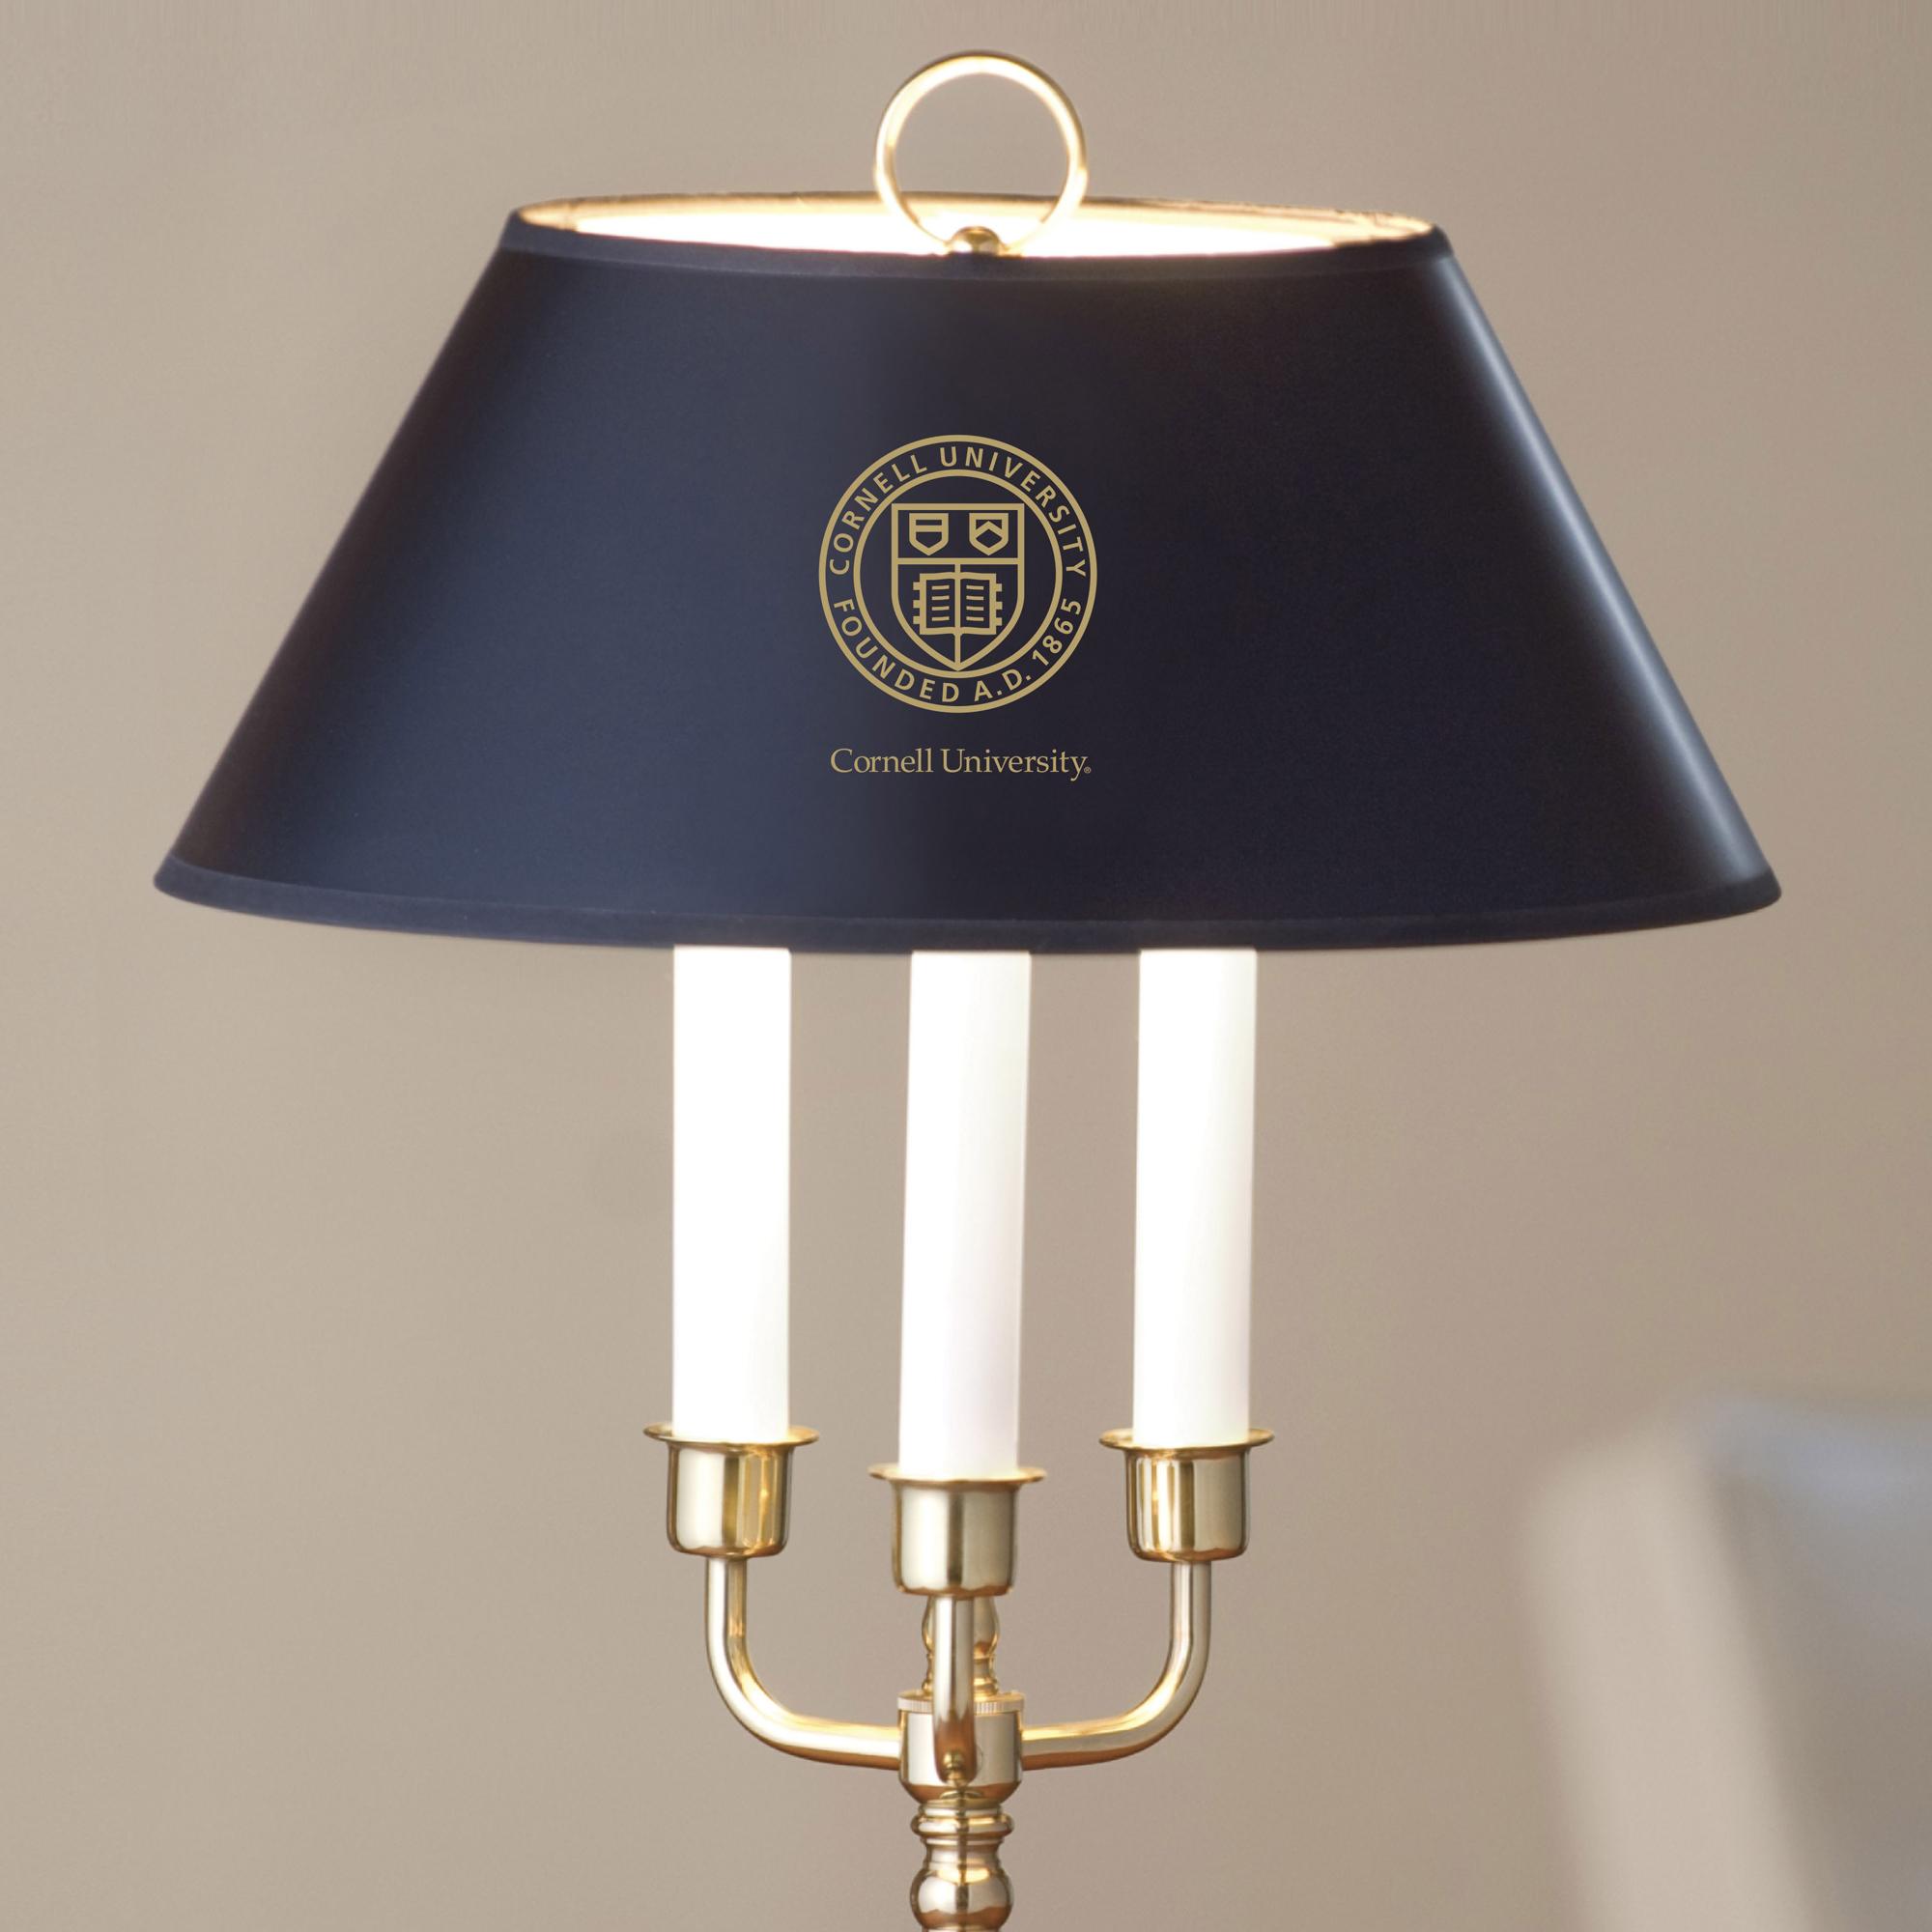 Cornell University Lamp in Brass & Marble - Image 2